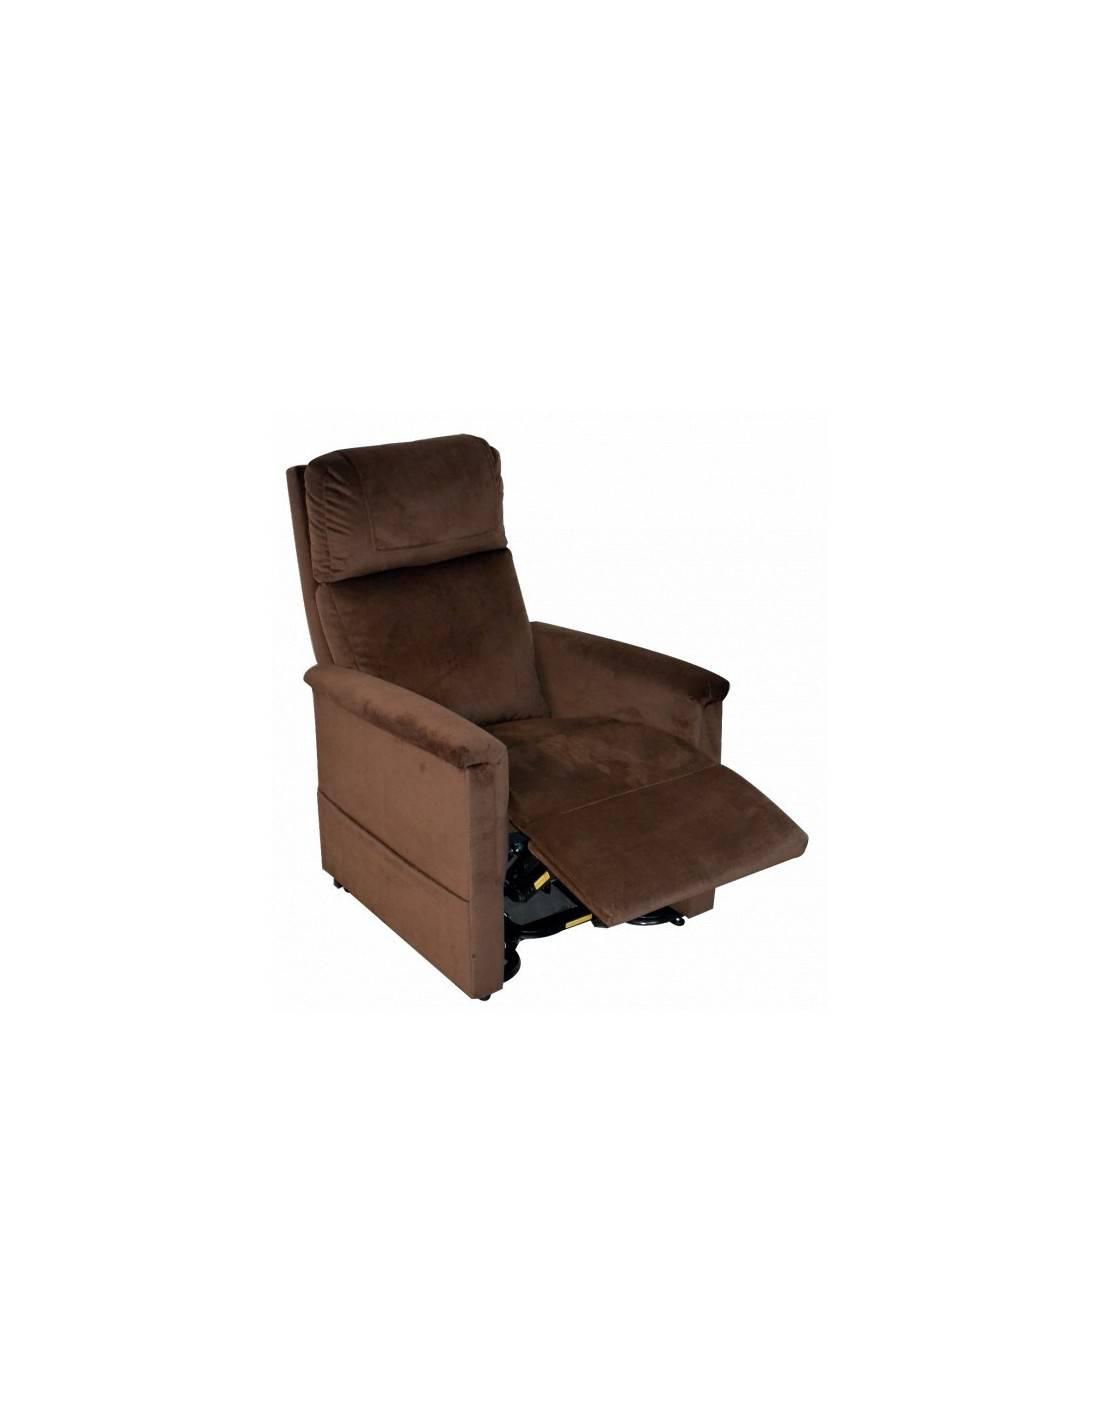 fauteuil releveur confort moderne 2 moteurs. Black Bedroom Furniture Sets. Home Design Ideas